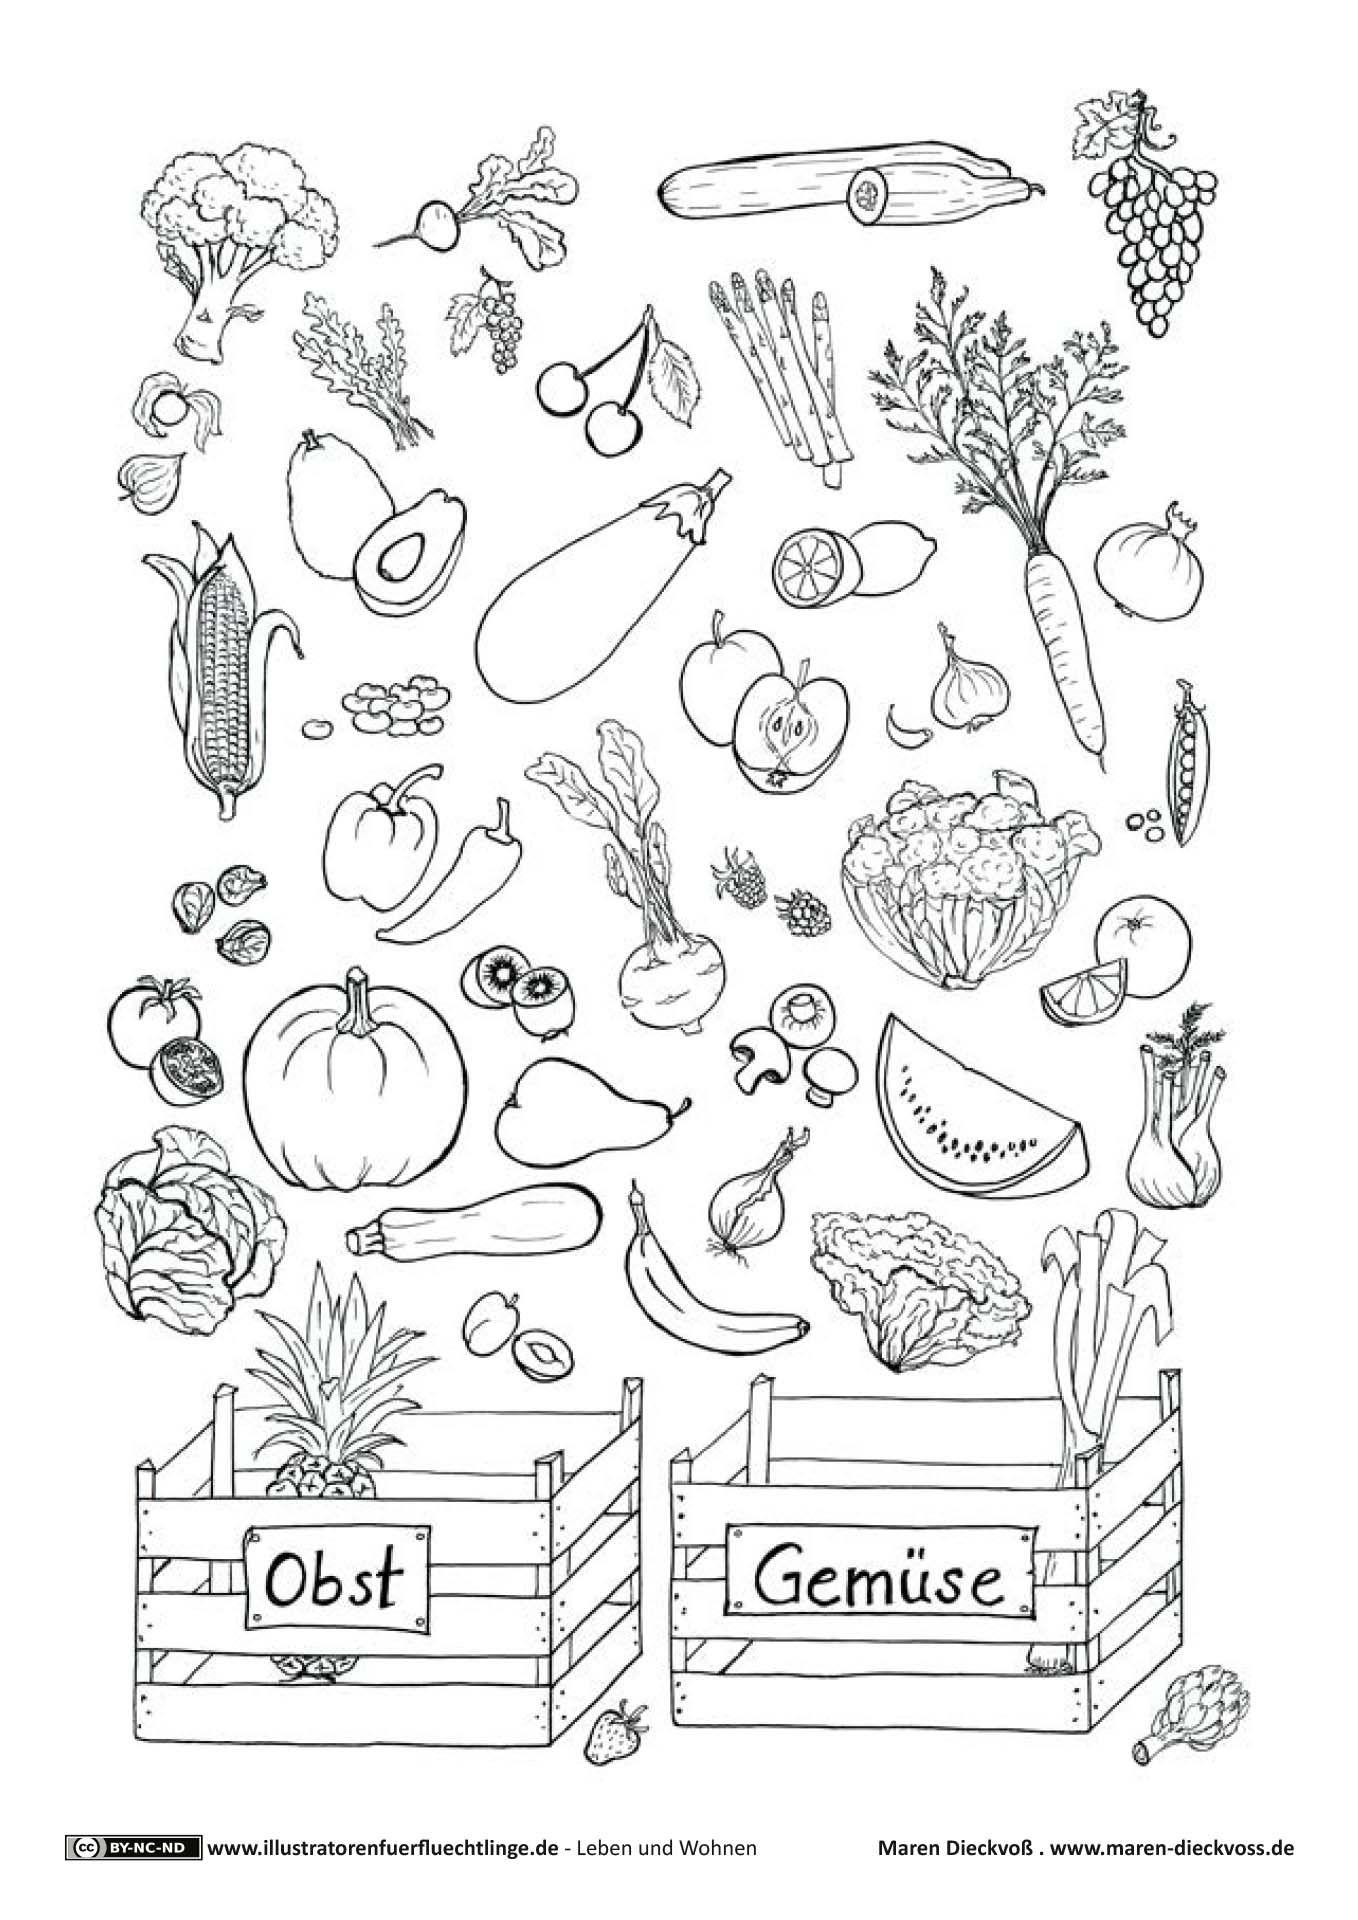 Obst Gemüse Ratespiel  Ratespiele, Vorschulideen, Kinder lernen